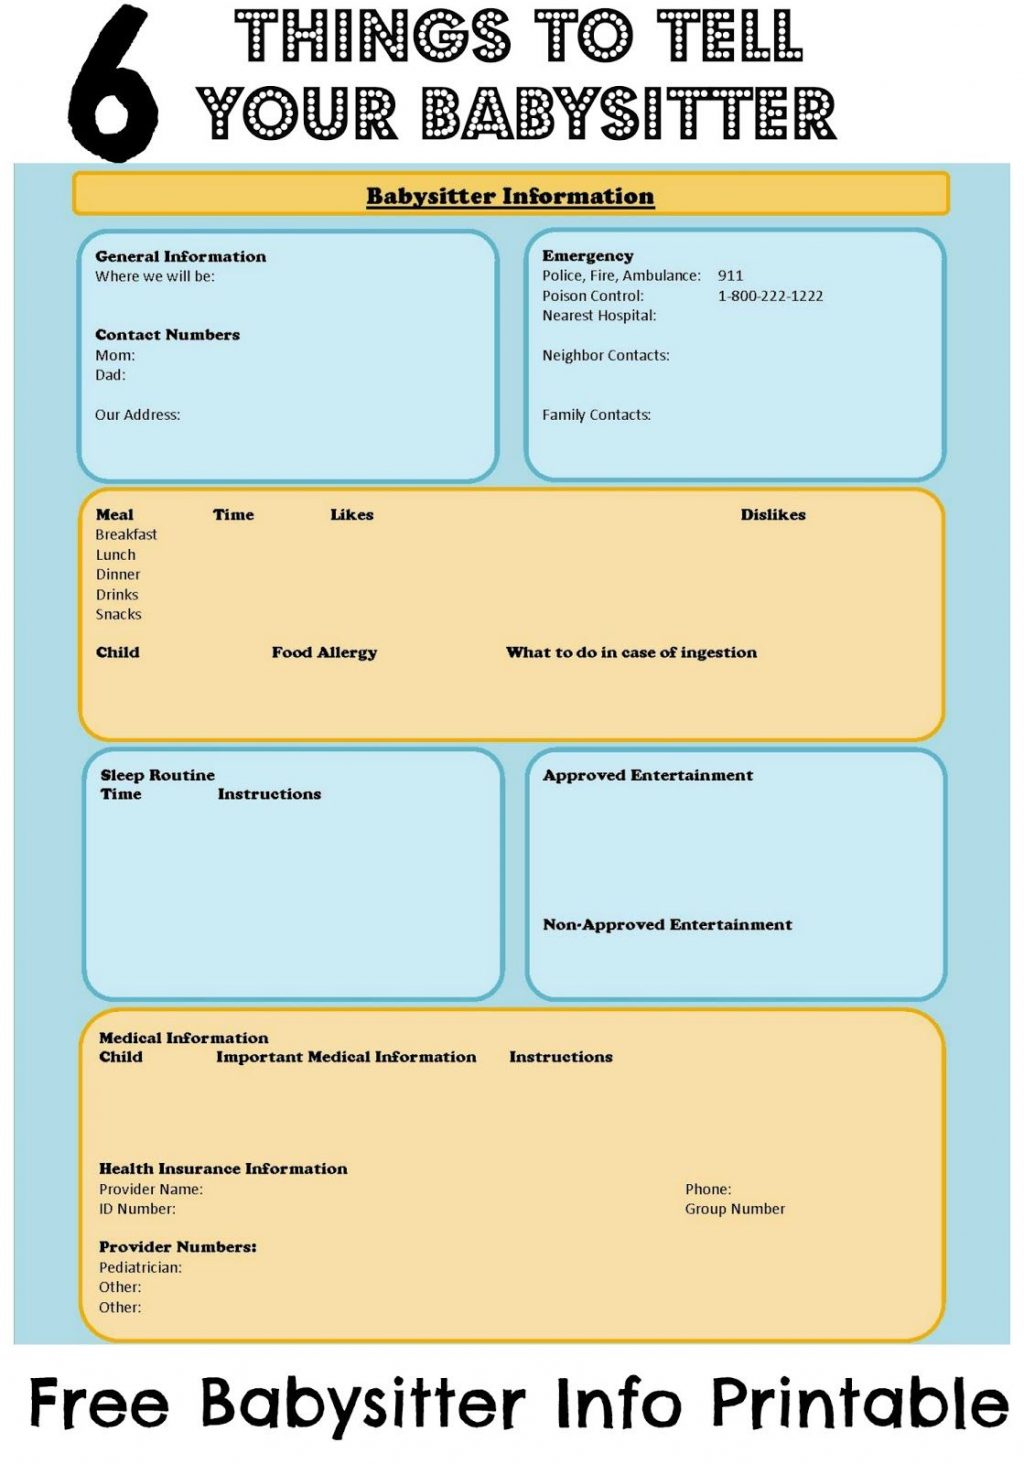 Babysitter Checklist Information Sheet With Free Ble Children Safety - Free Printable Parent Information Sheet